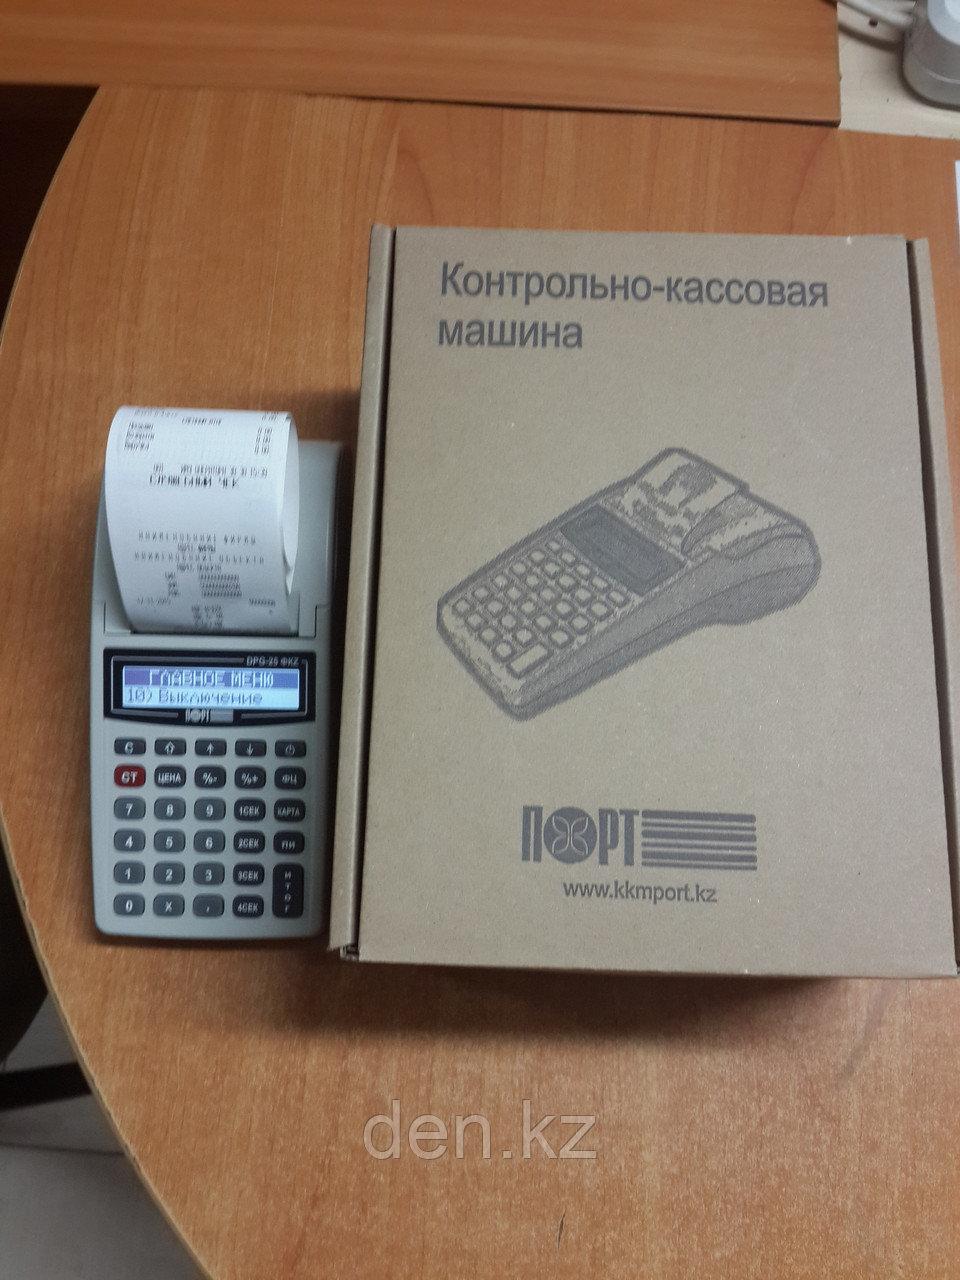 Кассовый аппарат ПОРТ DPG-25 версия онлайн